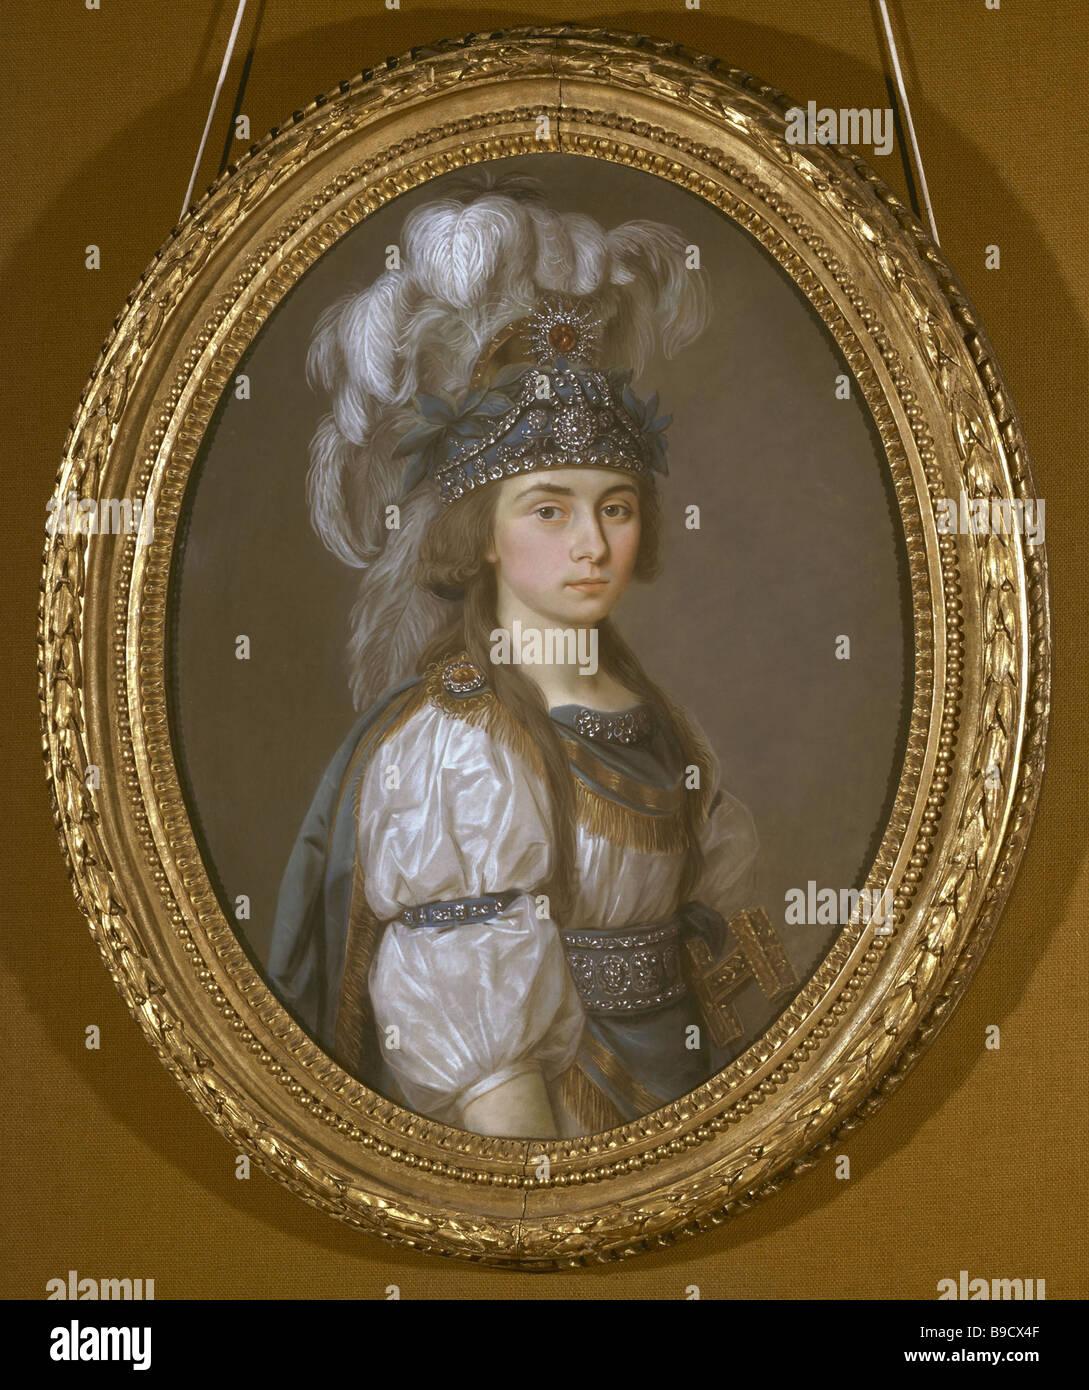 A portrait of Parasha Zhemchugova 1768 1803 renowned Russian serf actress Countess Sheremeteva in marriage Exhibited - Stock Image